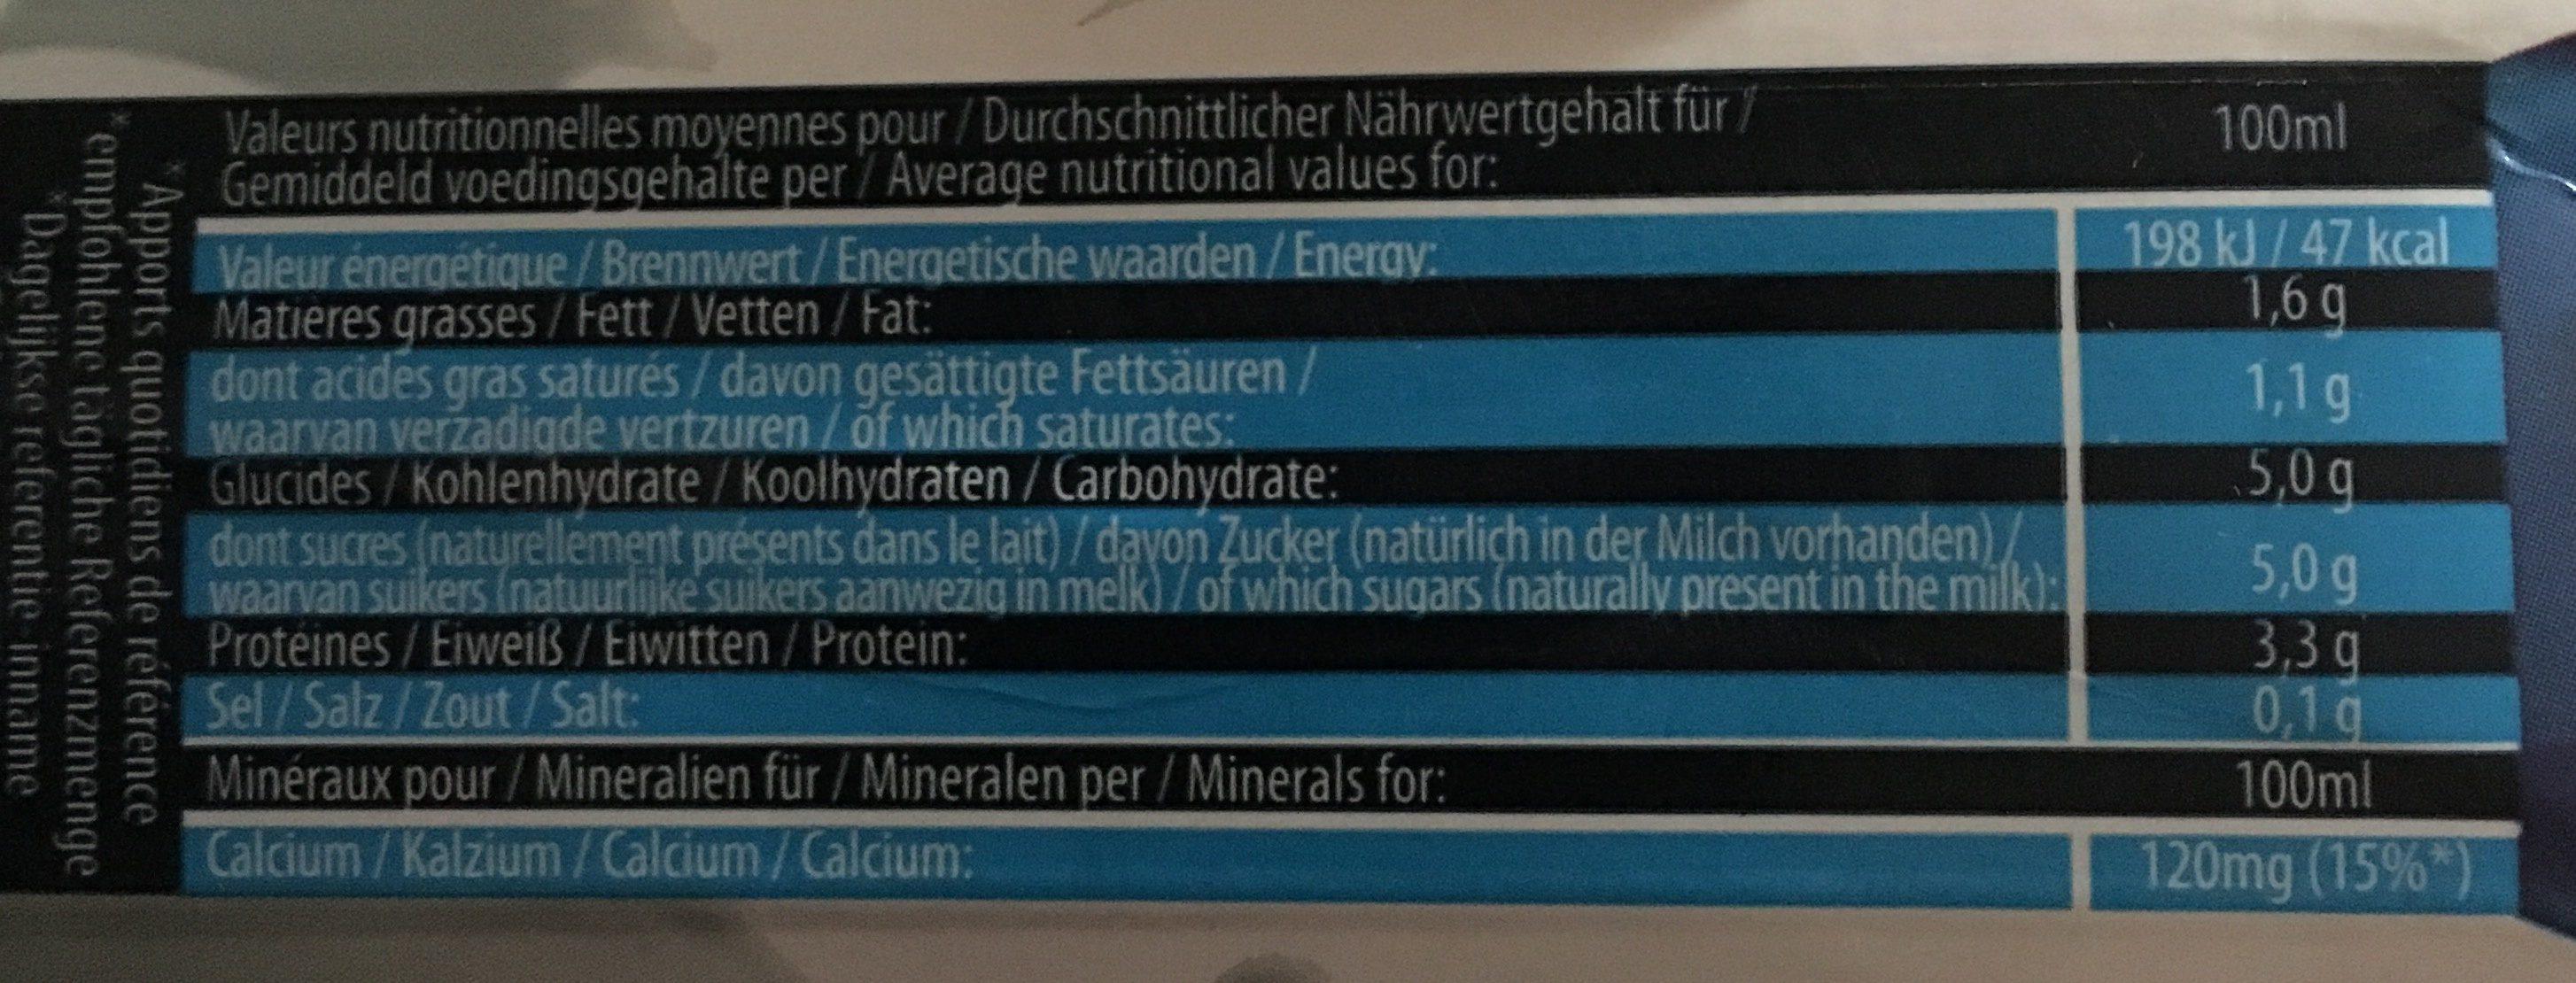 Luxlait - Ingredienti - fr